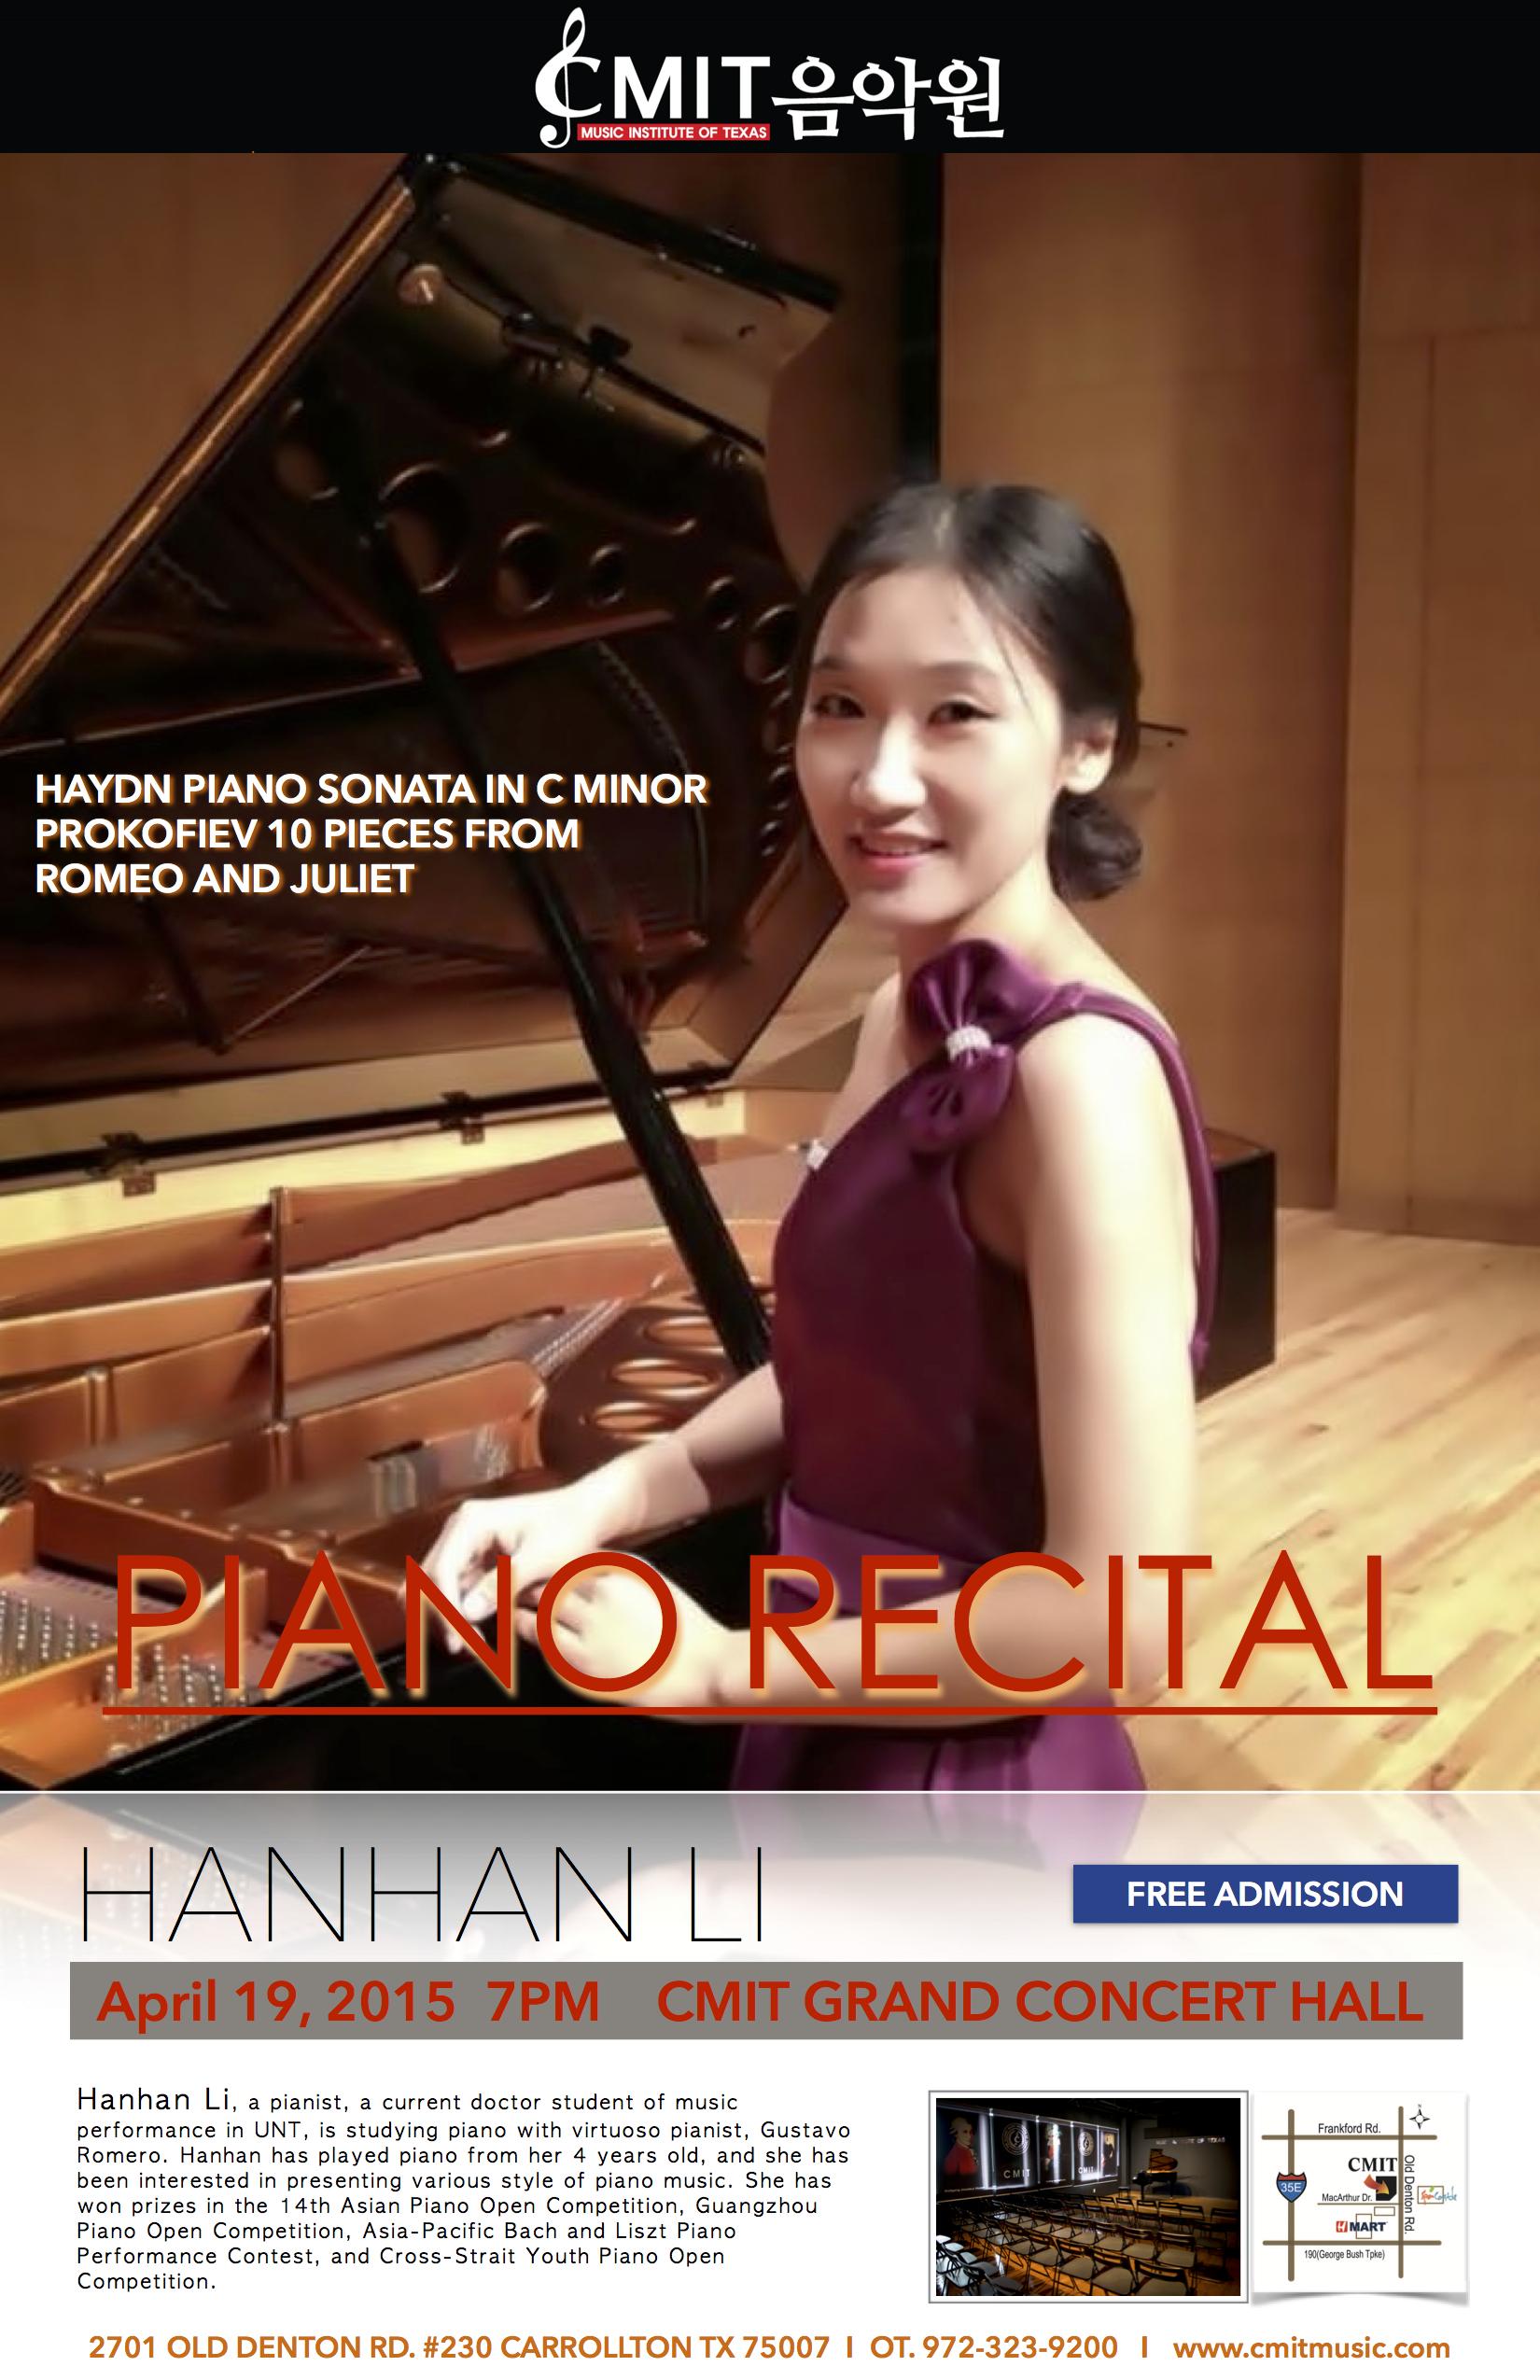 Hanhan Li - Piano Recital 041915.jpg